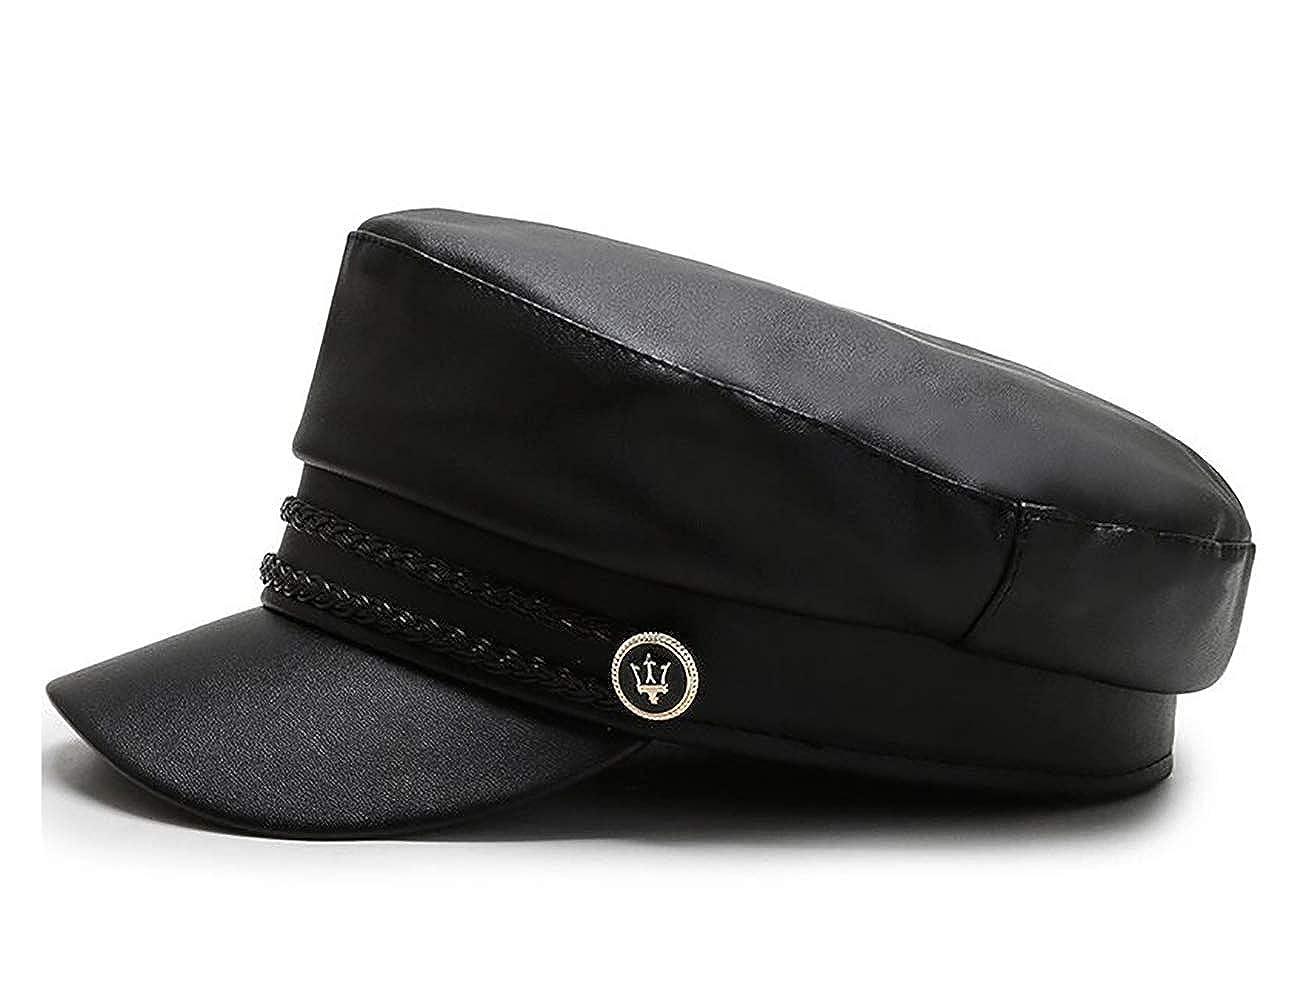 Mariner Style Flat Cap Women PU Leather Beret Newsboy Cap Barge Fiddler Cap